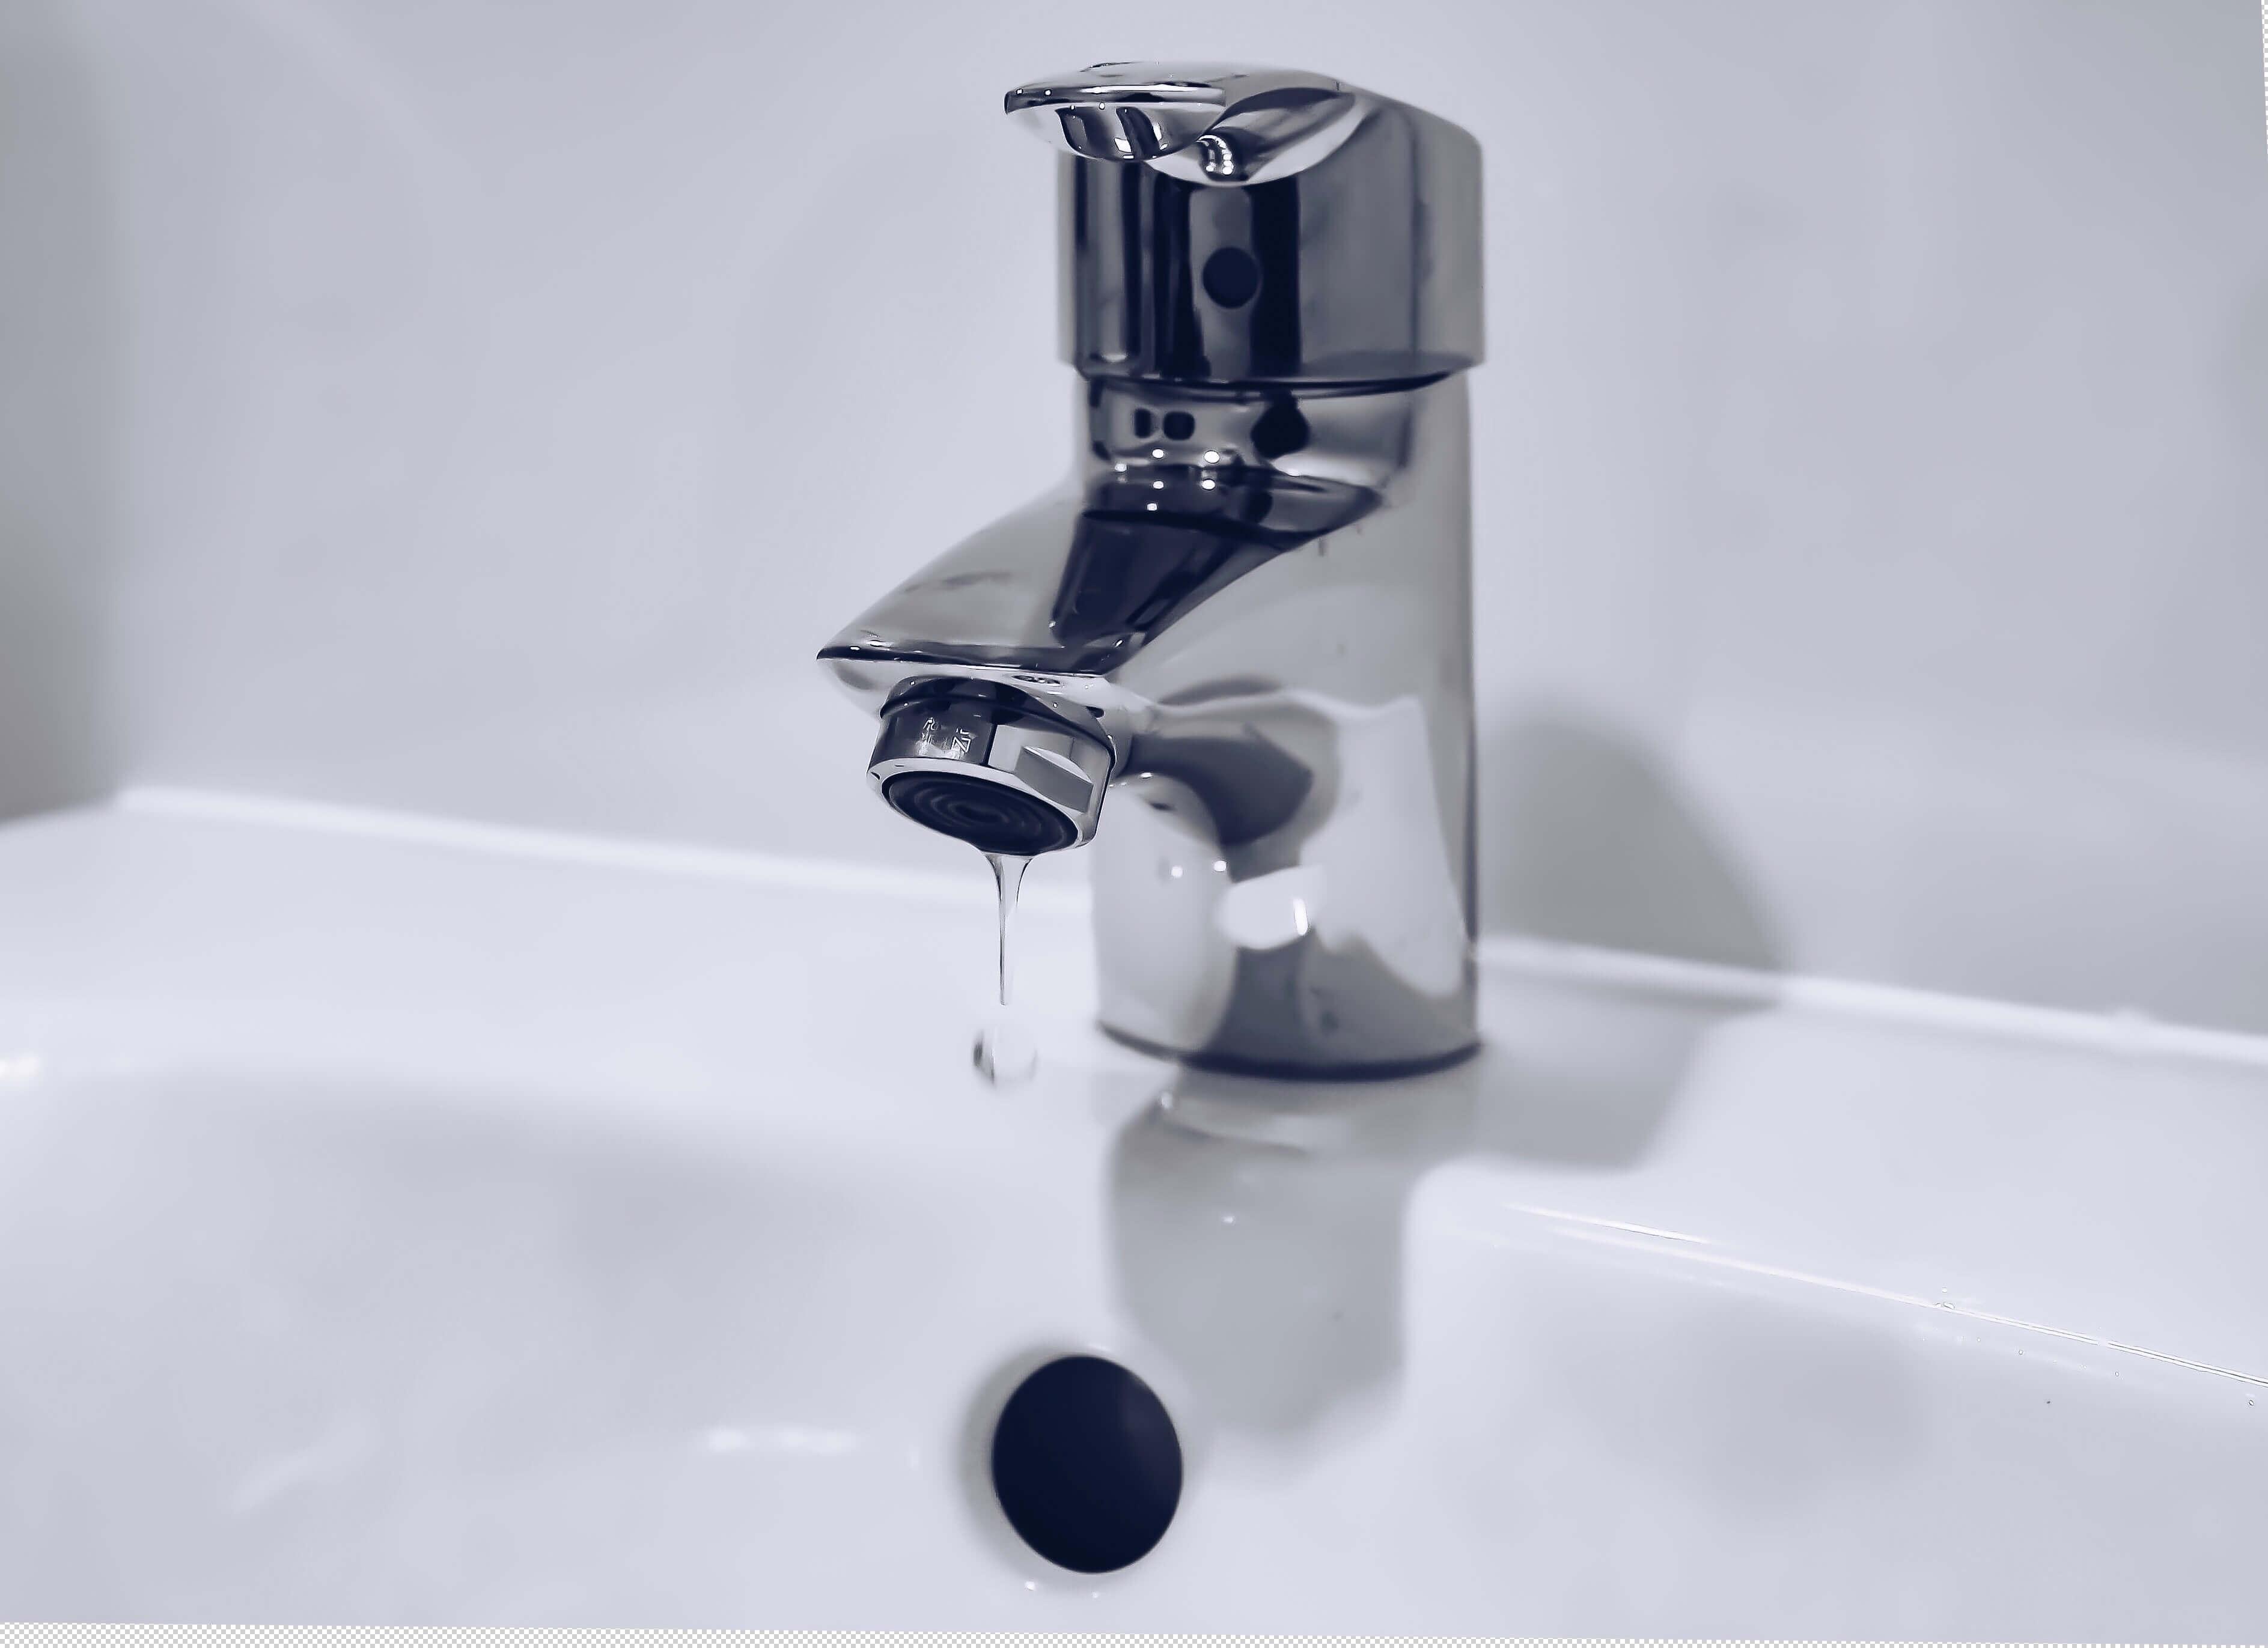 sink faucet leak